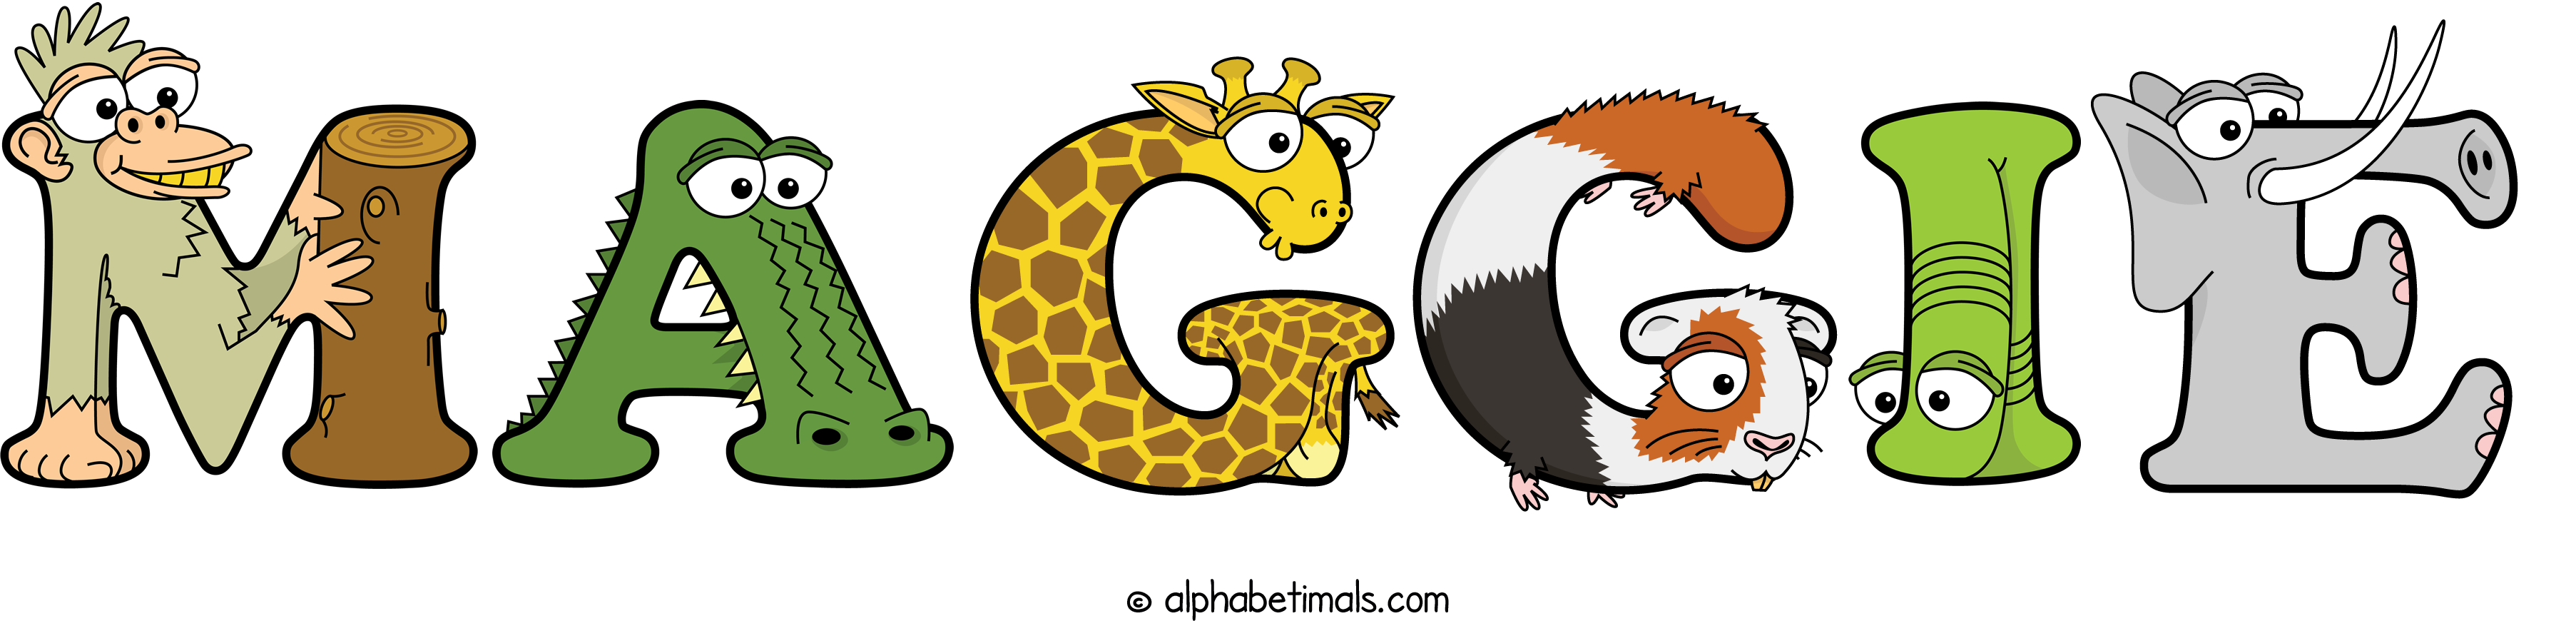 The word MAGGIE written in cute cartoon animal drawings